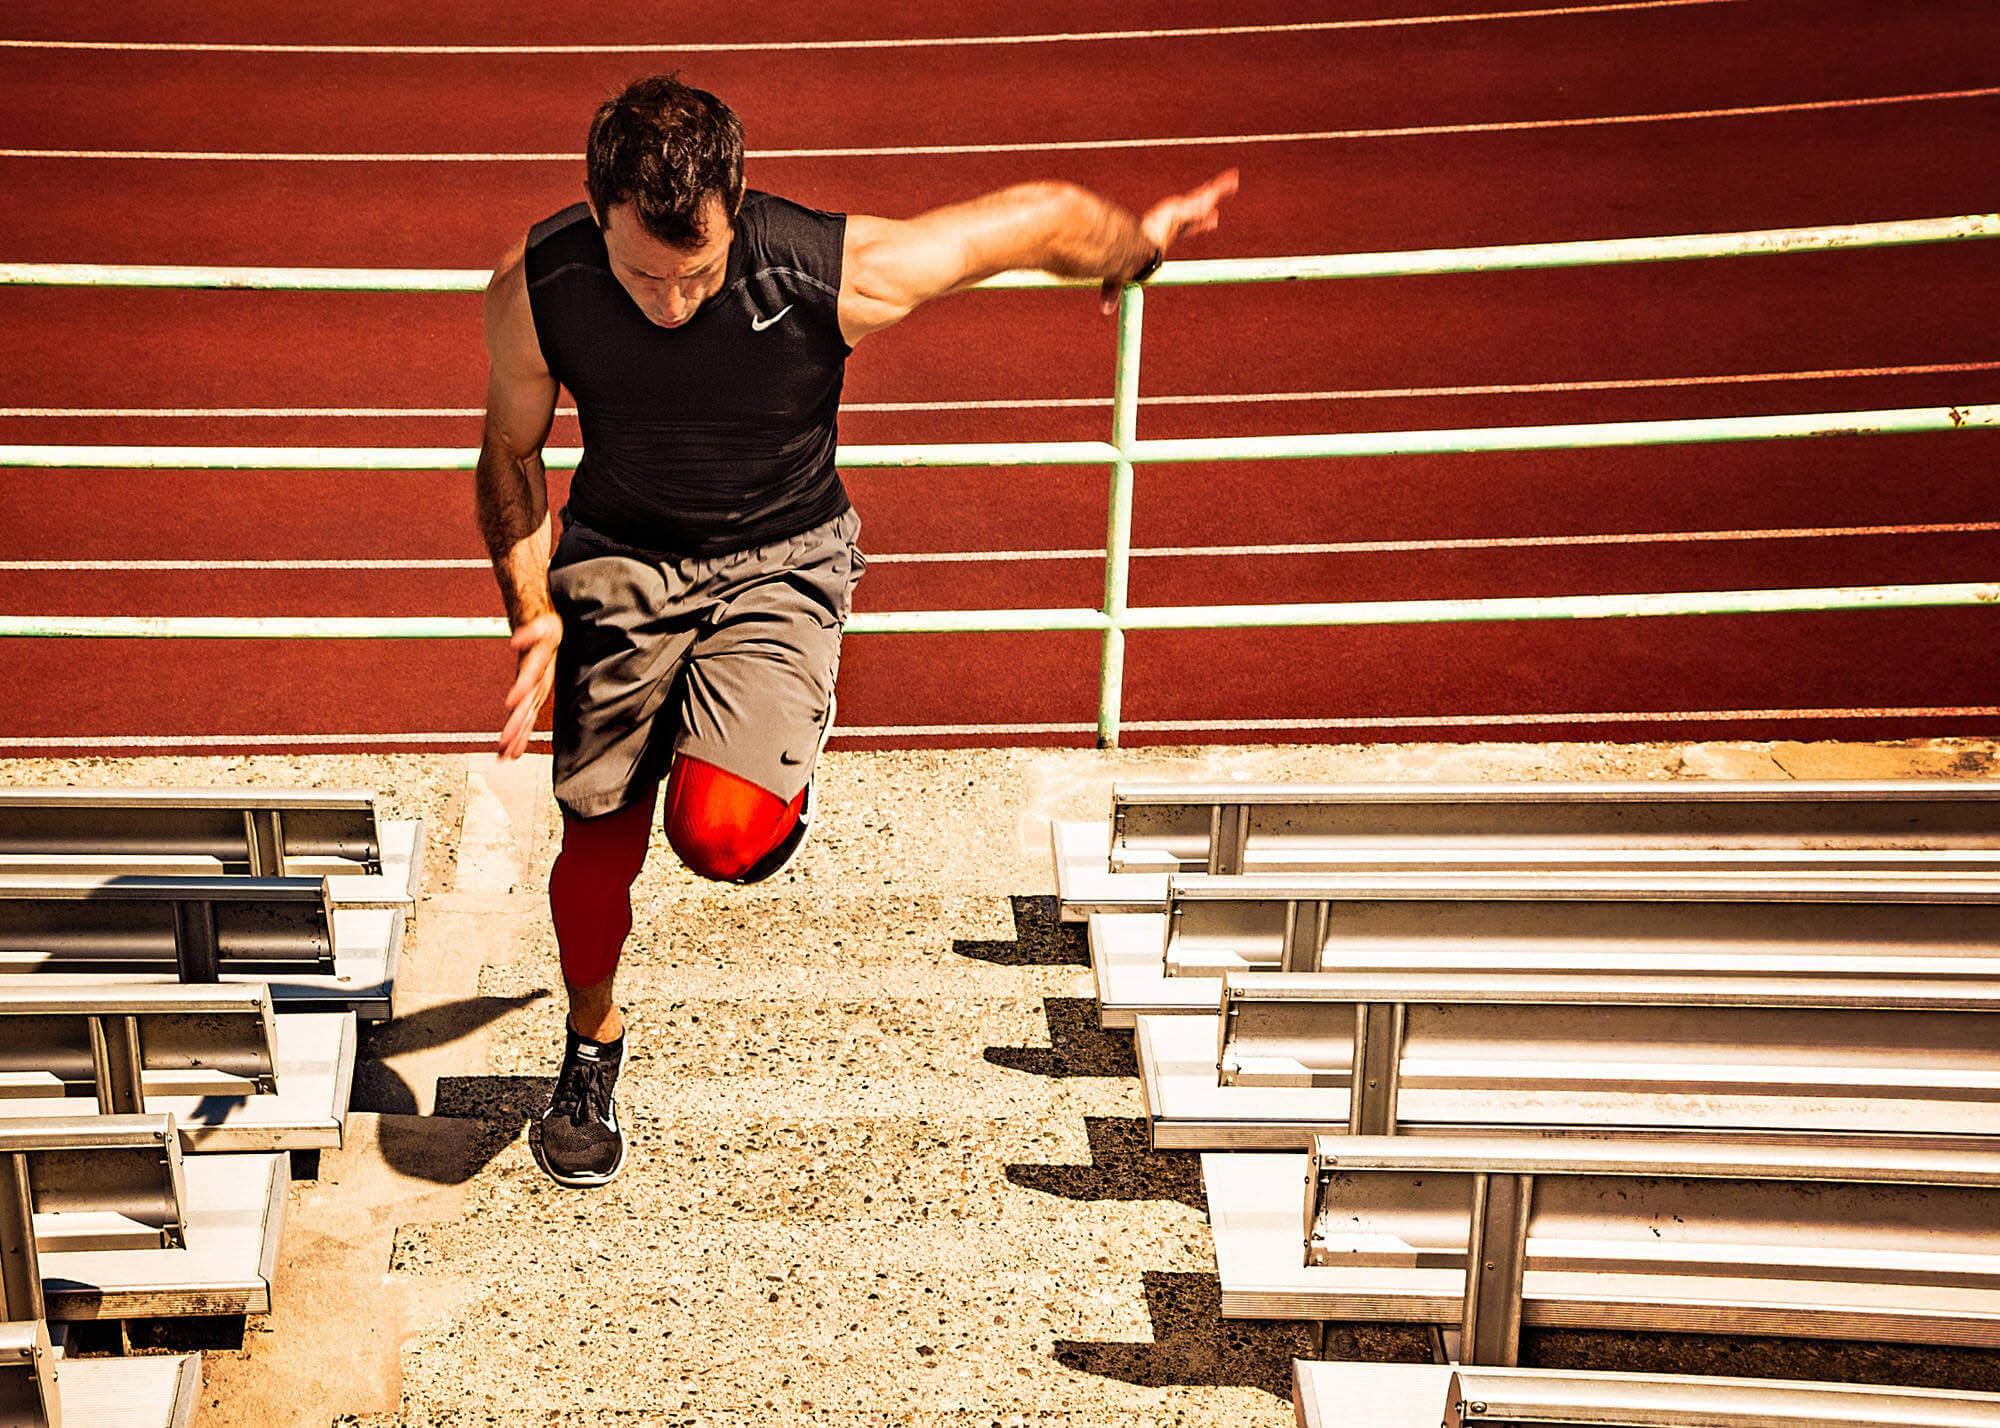 Athlete sprinting up stadium steps